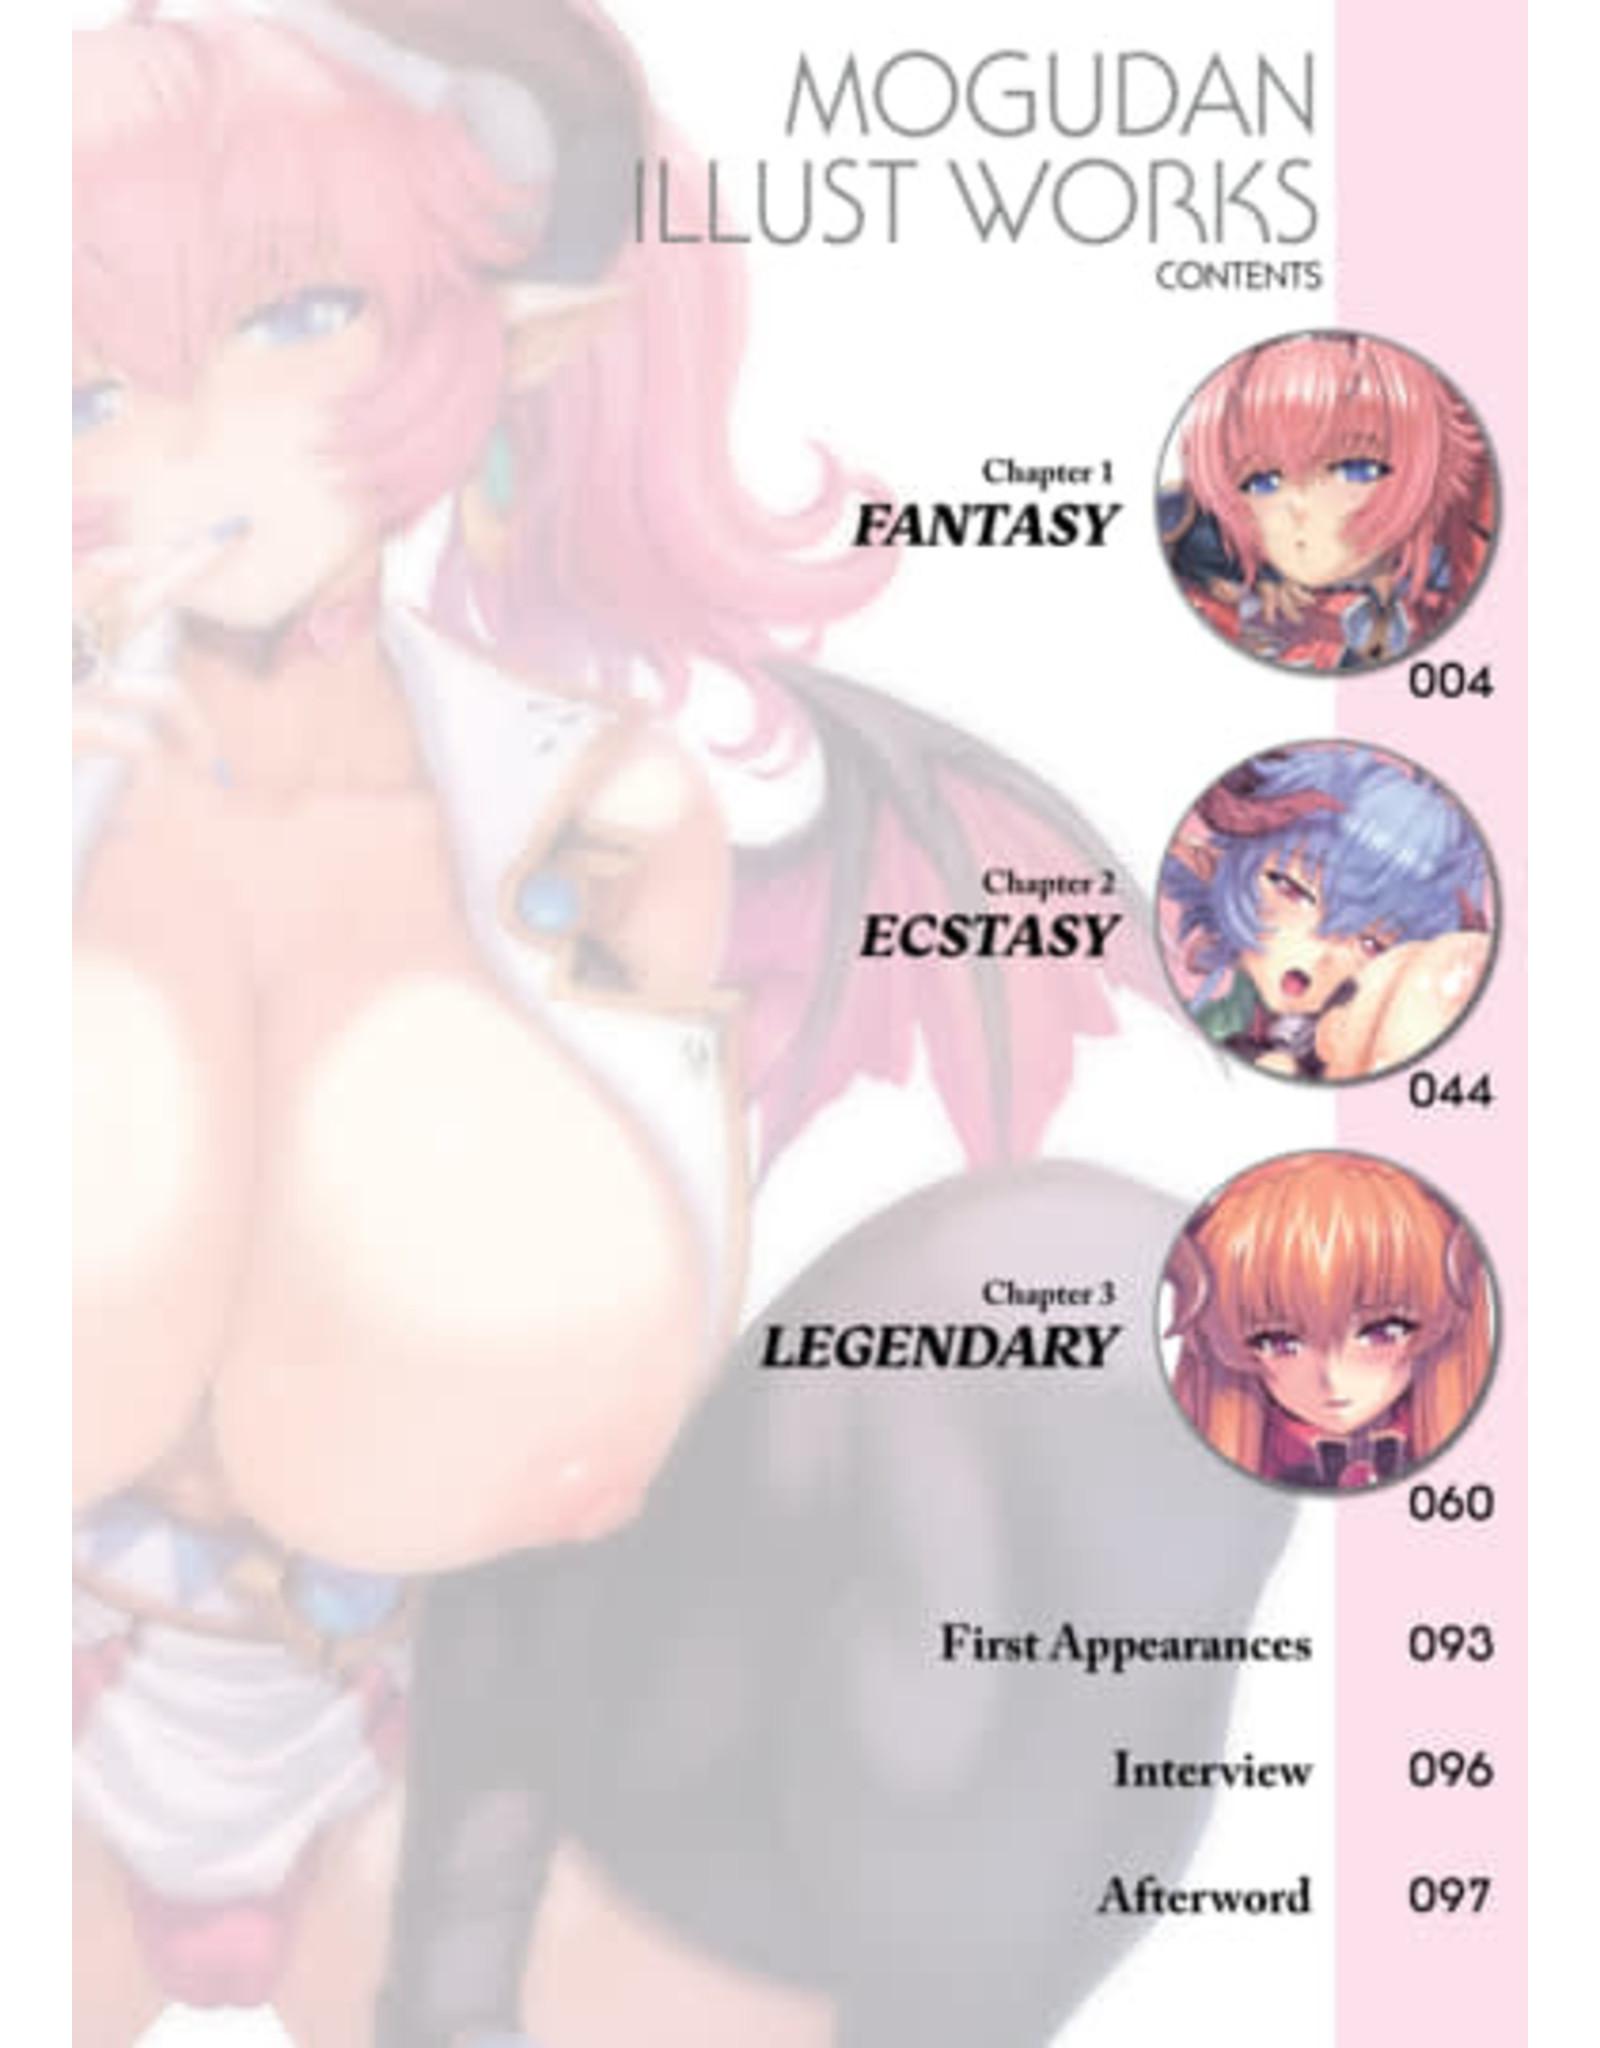 XXX Hentai: Mogudan Illust Works - Art Book (English)